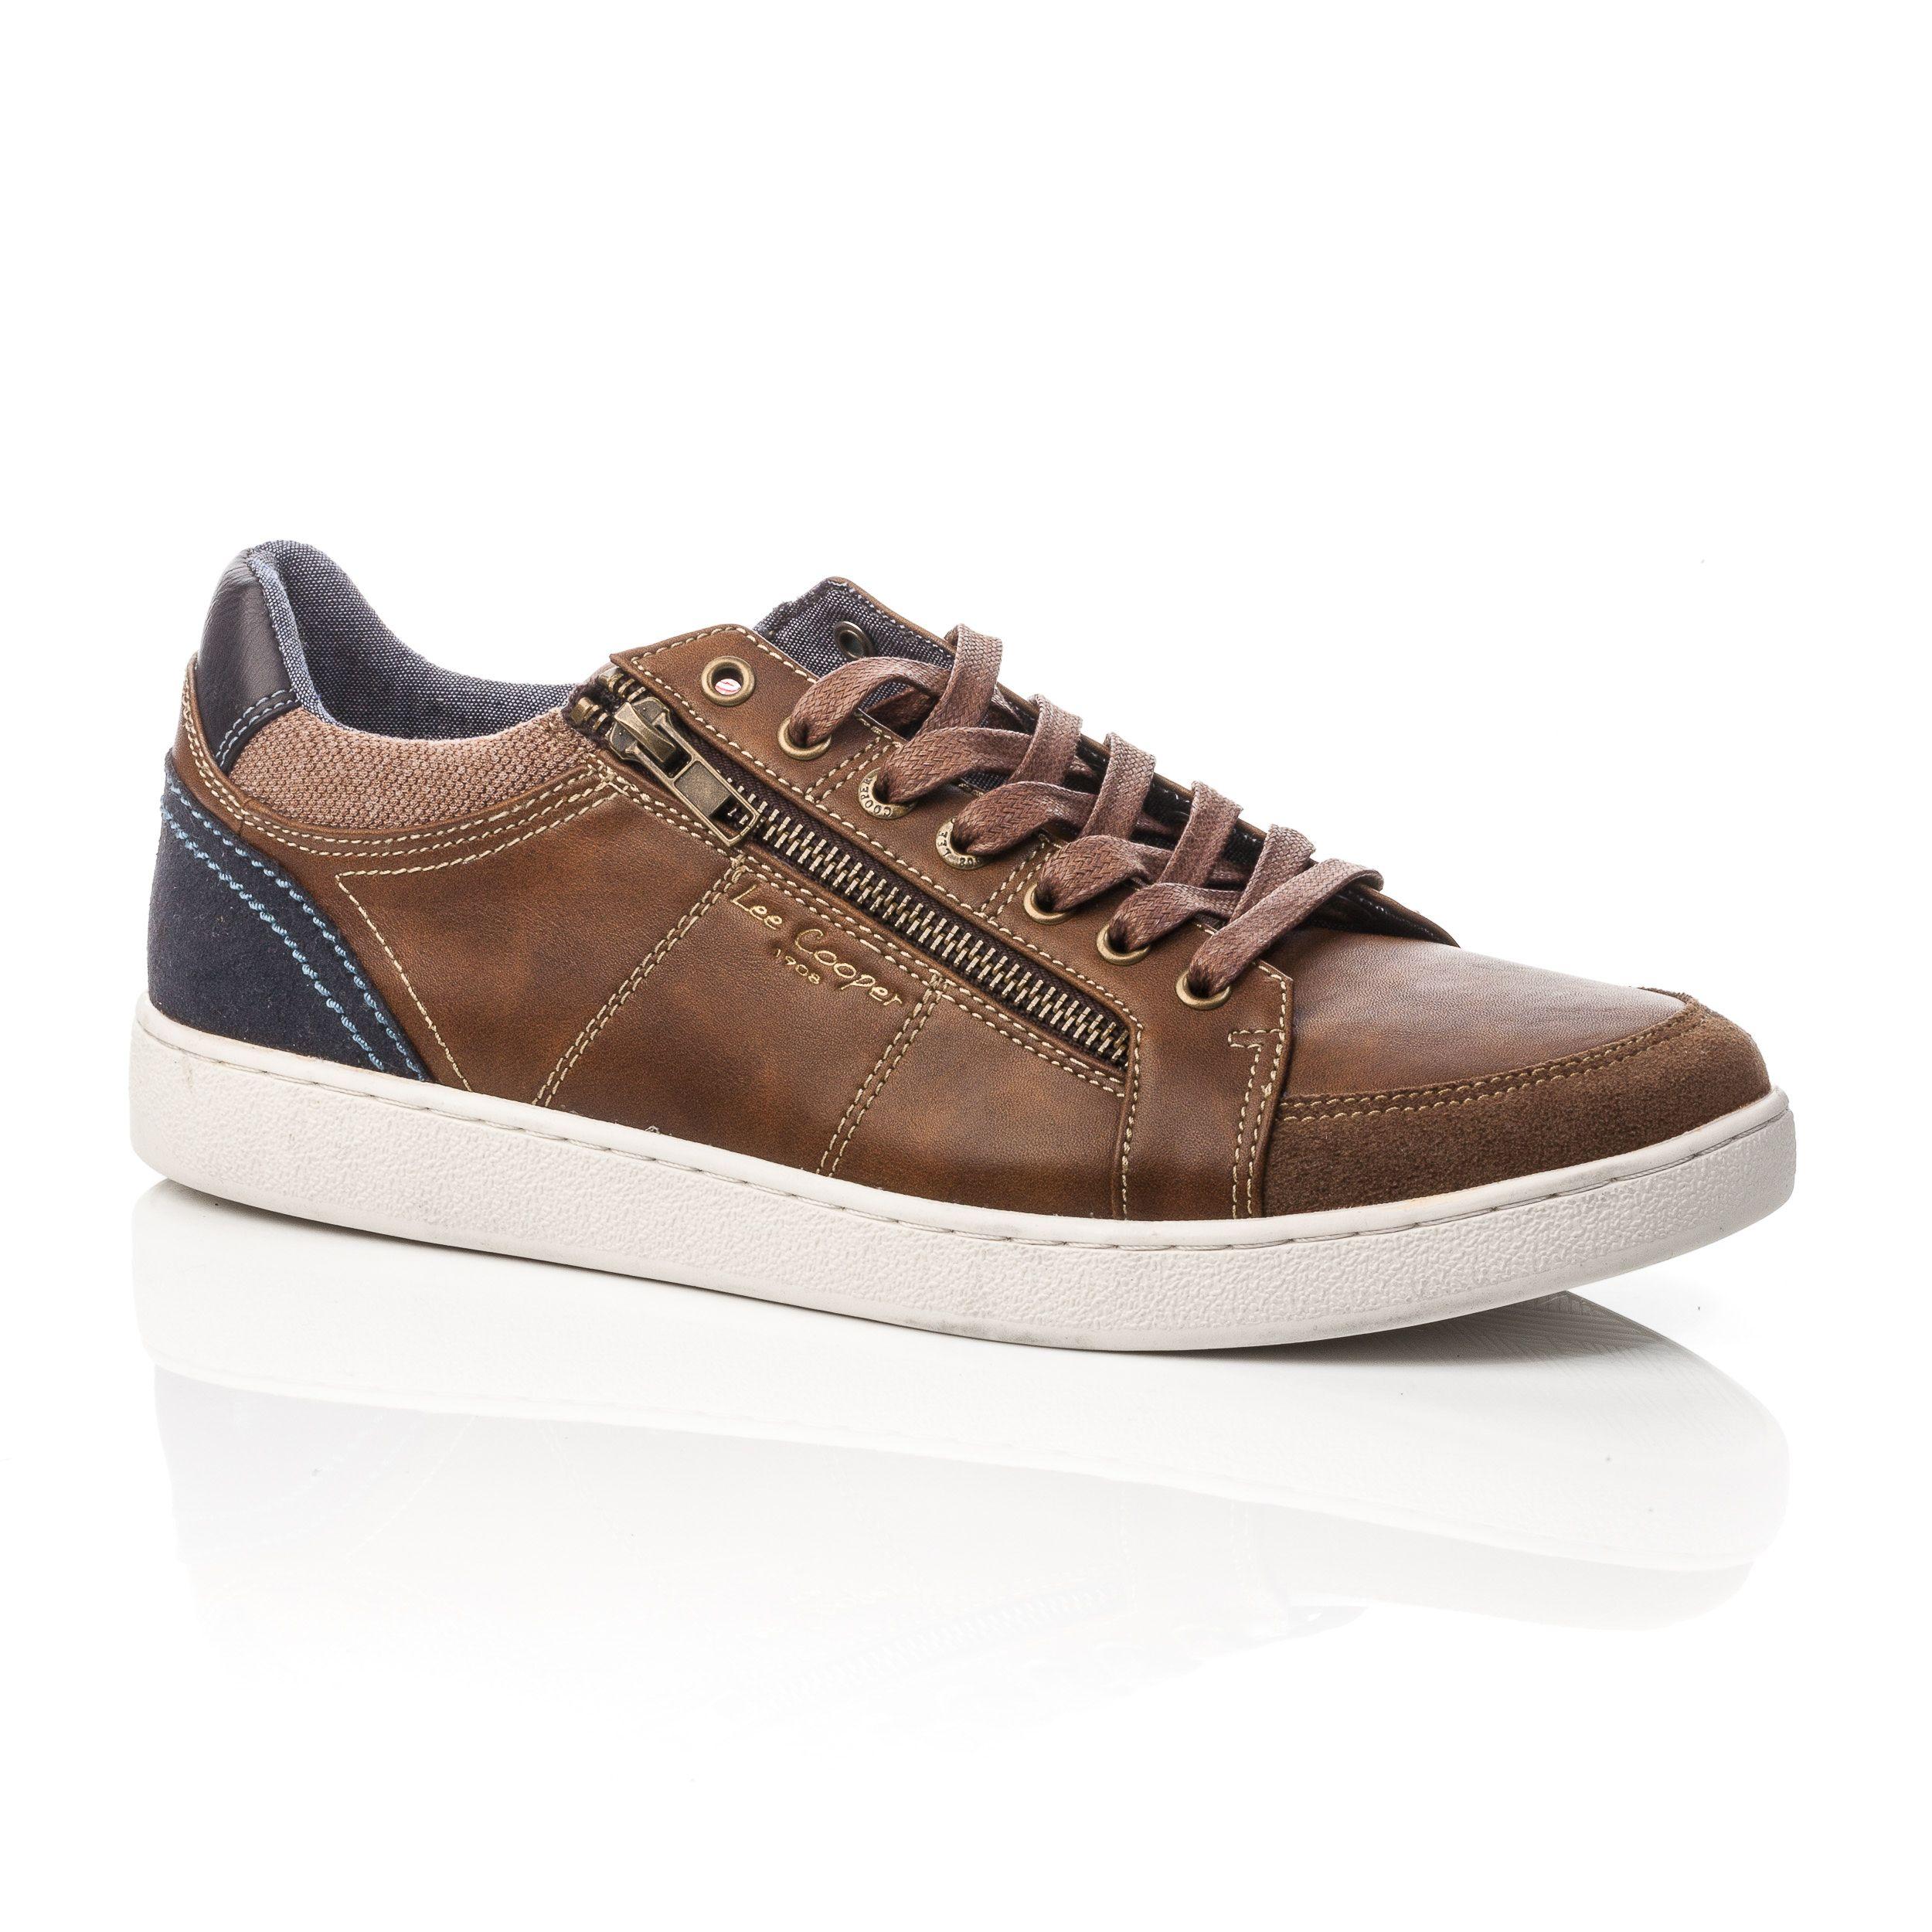 Baskets Sneakers Homme Marron   Sneakers, Basket sneakers